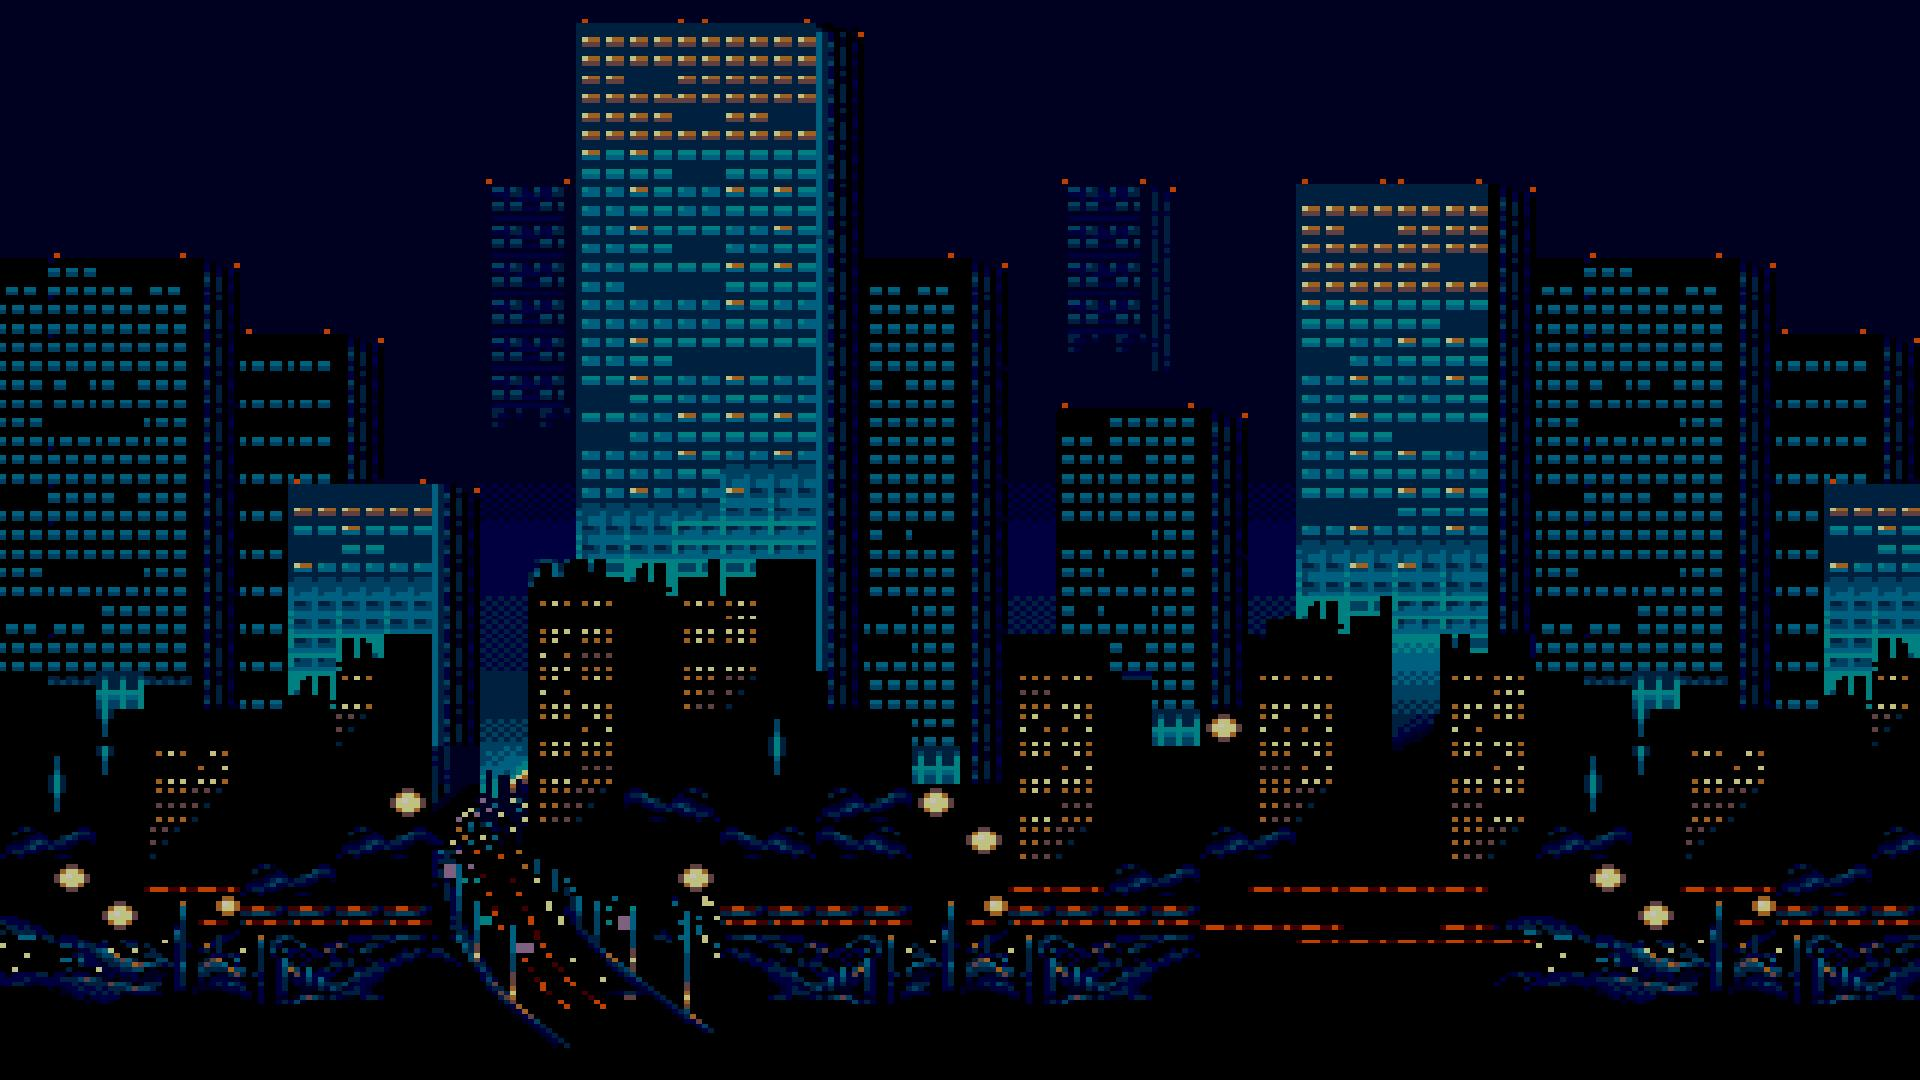 Inspirational Desktop Backgrounds